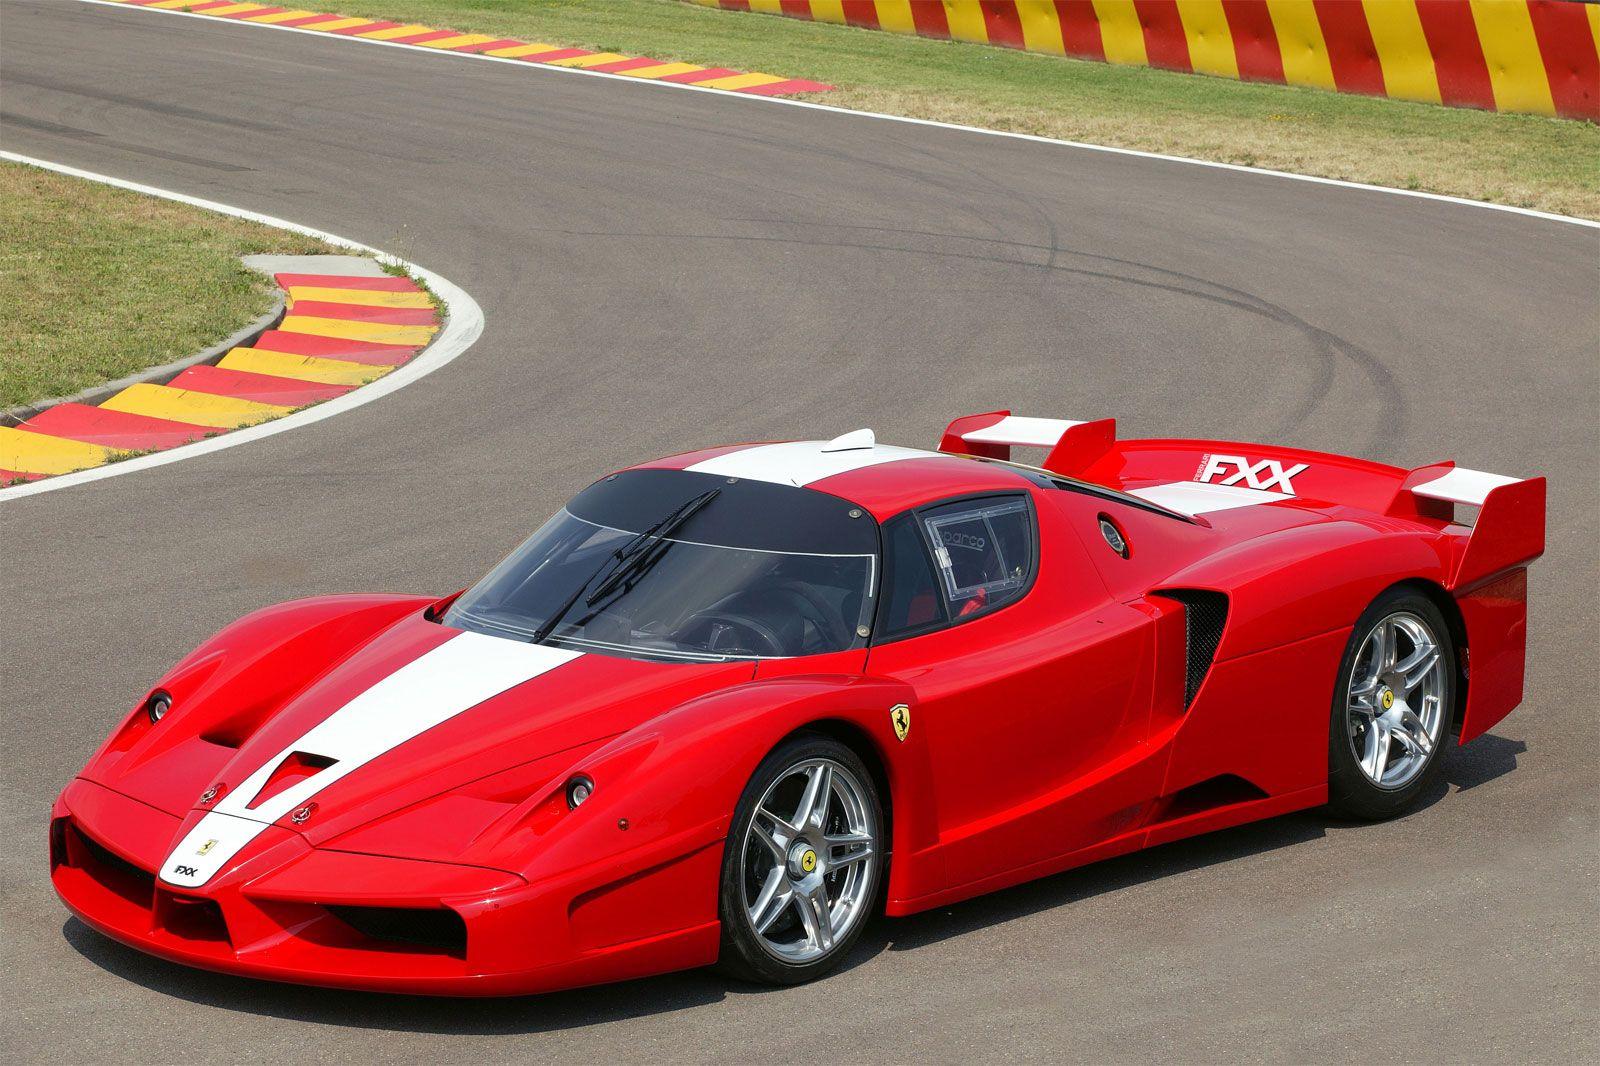 A List Of The Rarest Supercars Ferrari Fxx Super Cars Ferrari Laferrari